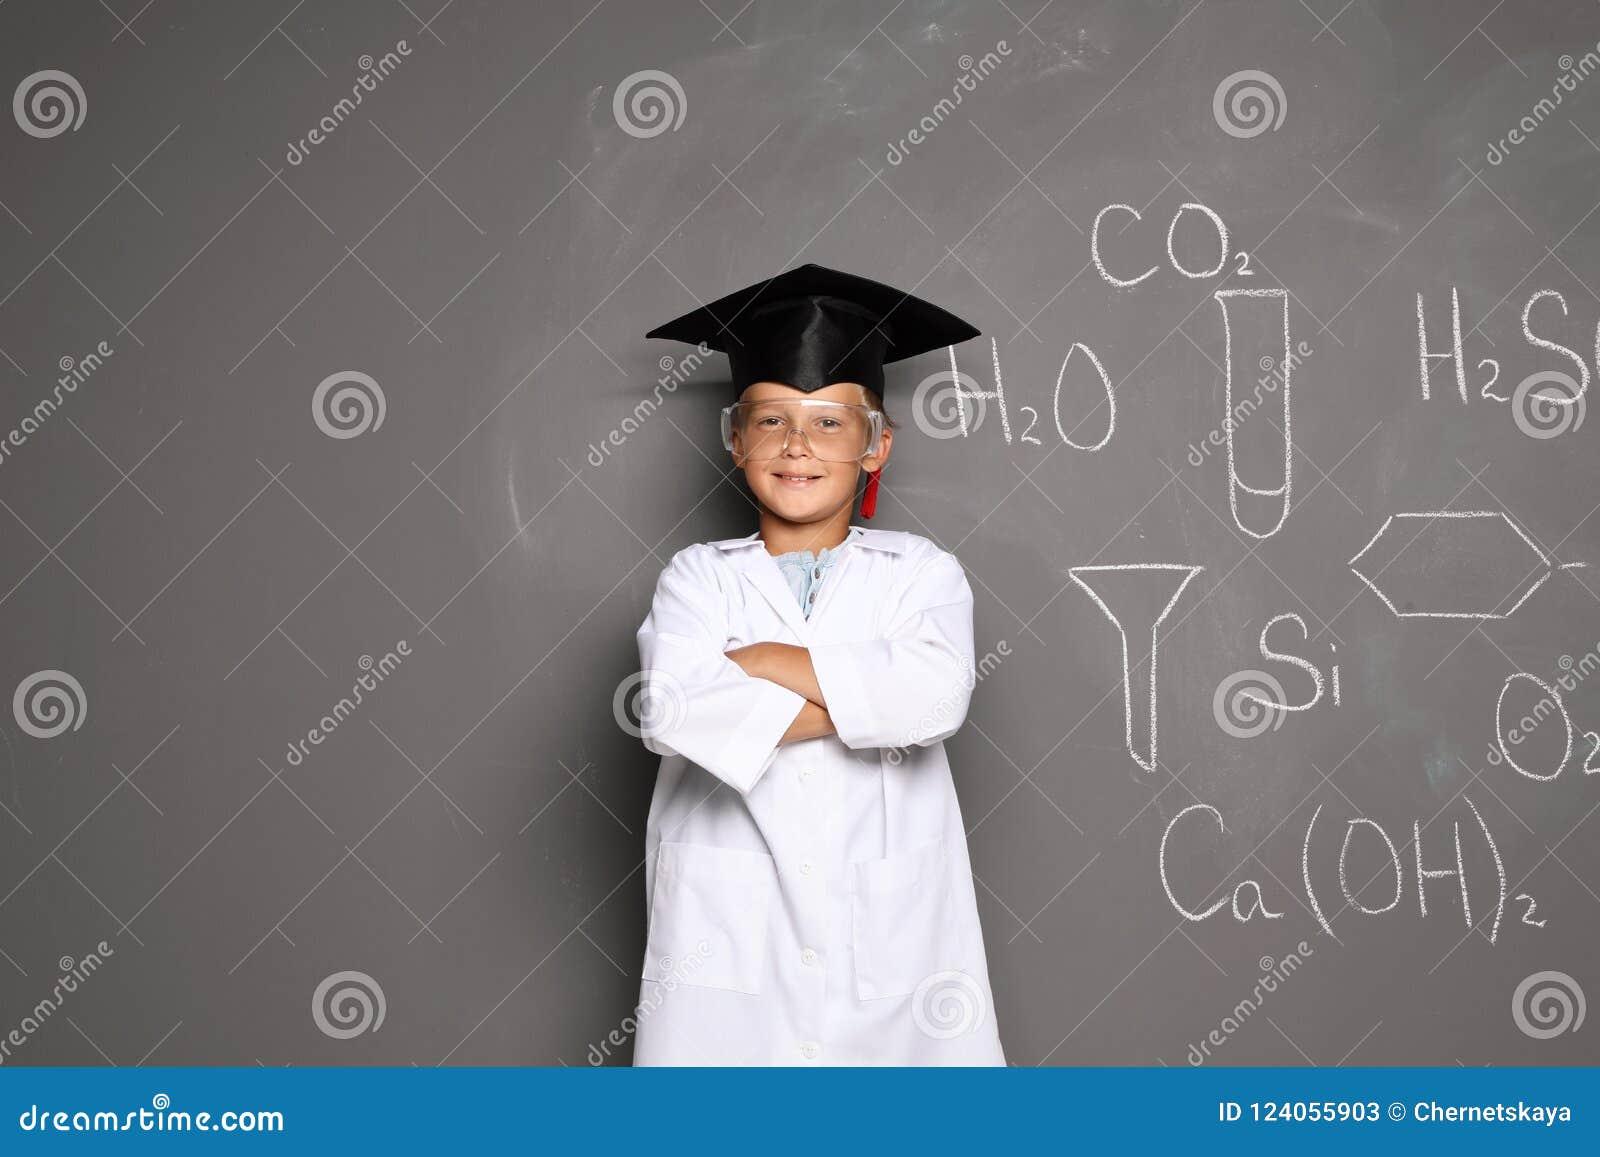 Little school child in laboratory uniform with graduate cap